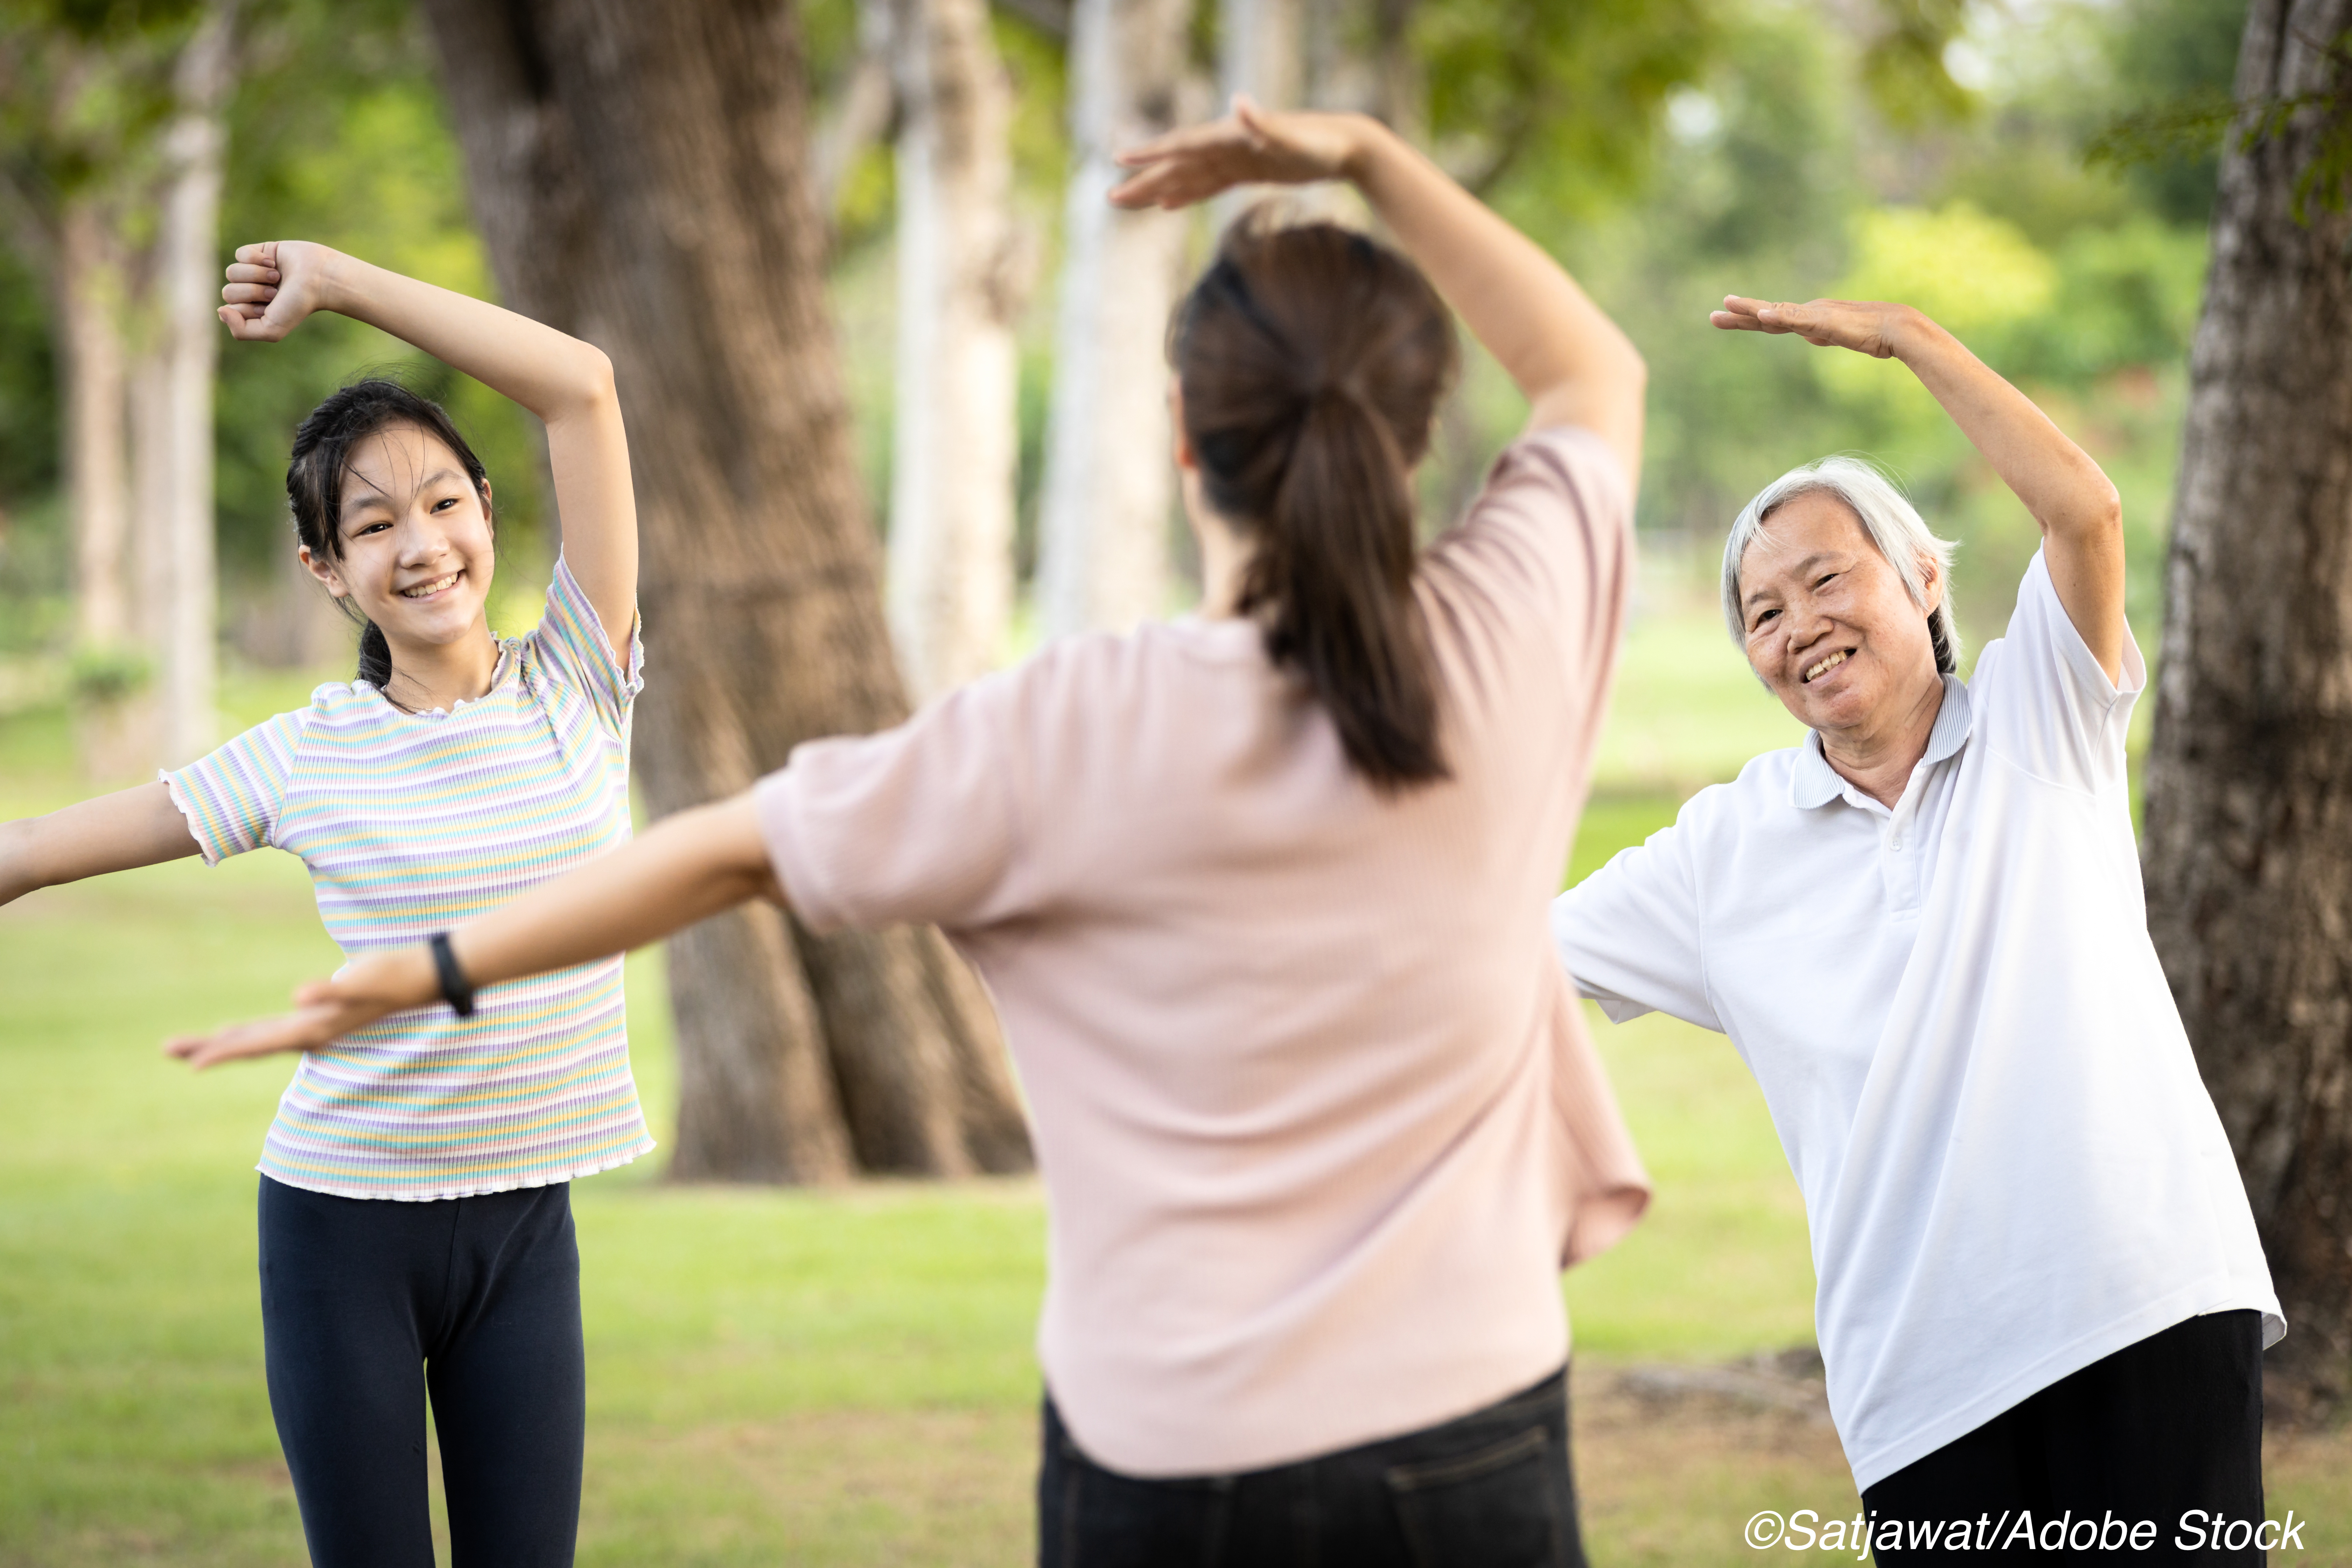 Inactivity: A Major Global Health Risk